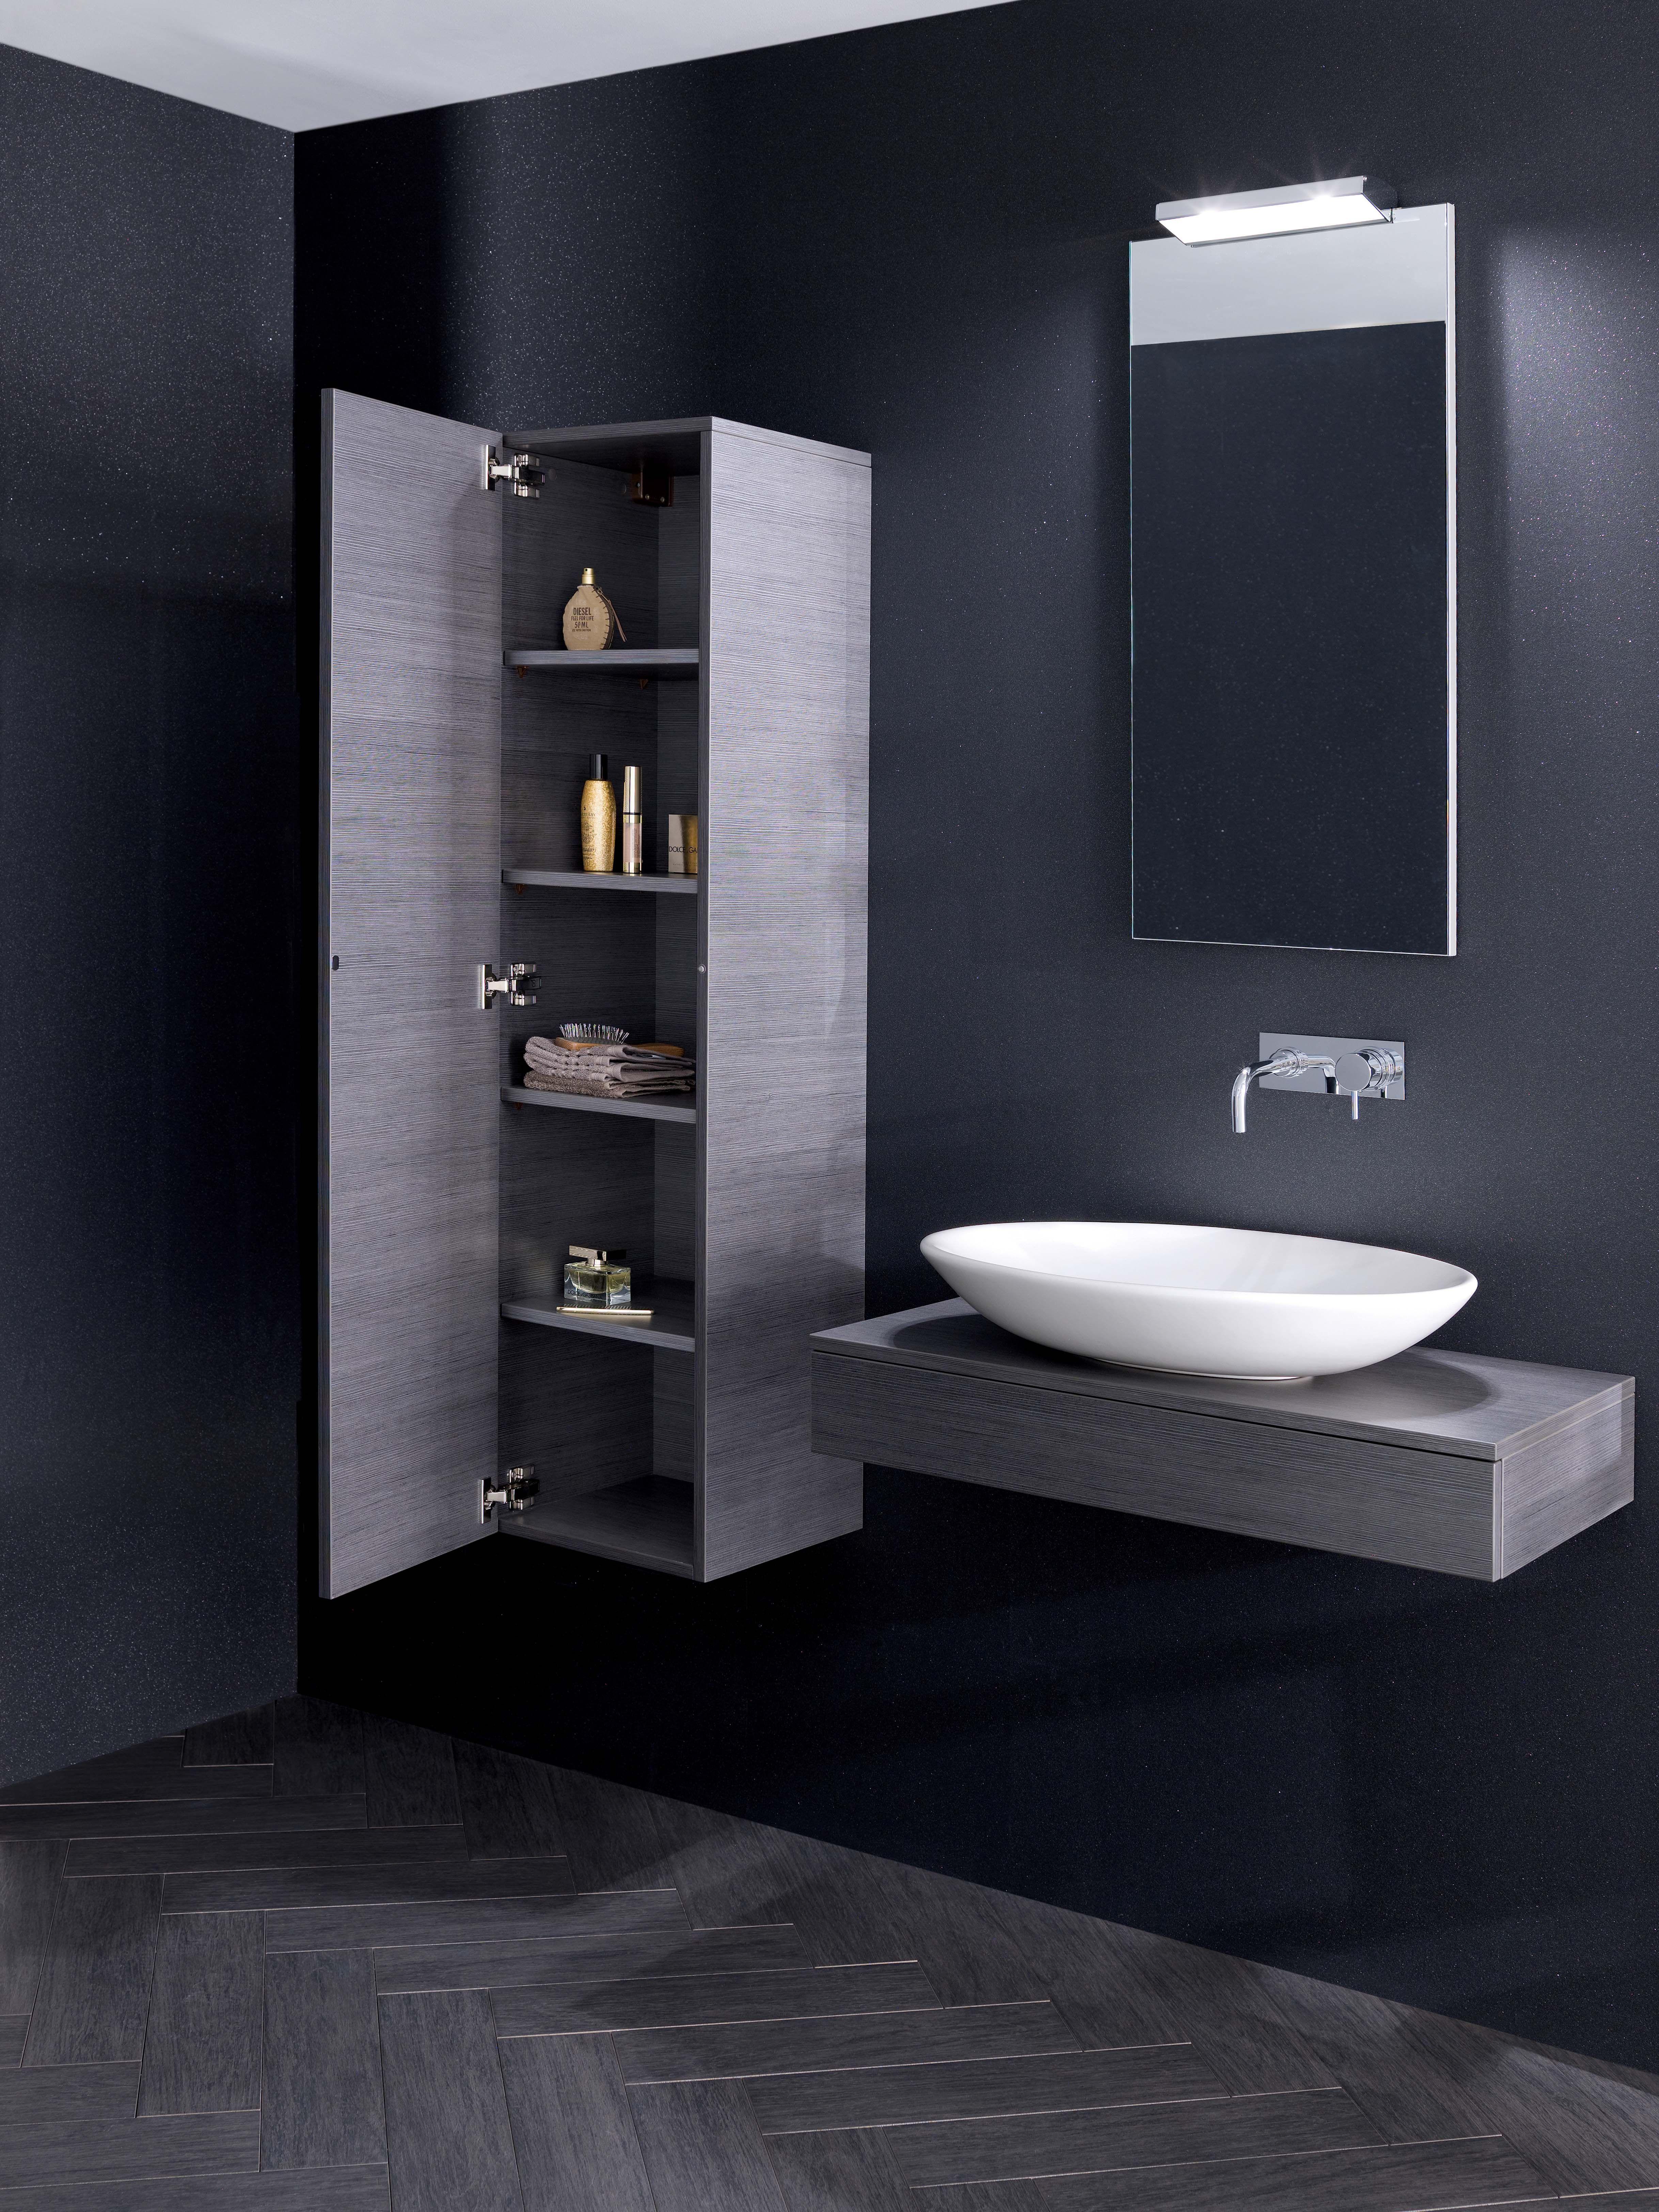 Edge Steel Bathroom Furniture Range From Crosswater Http Www Bauhaus Bathrooms Co Uk Category